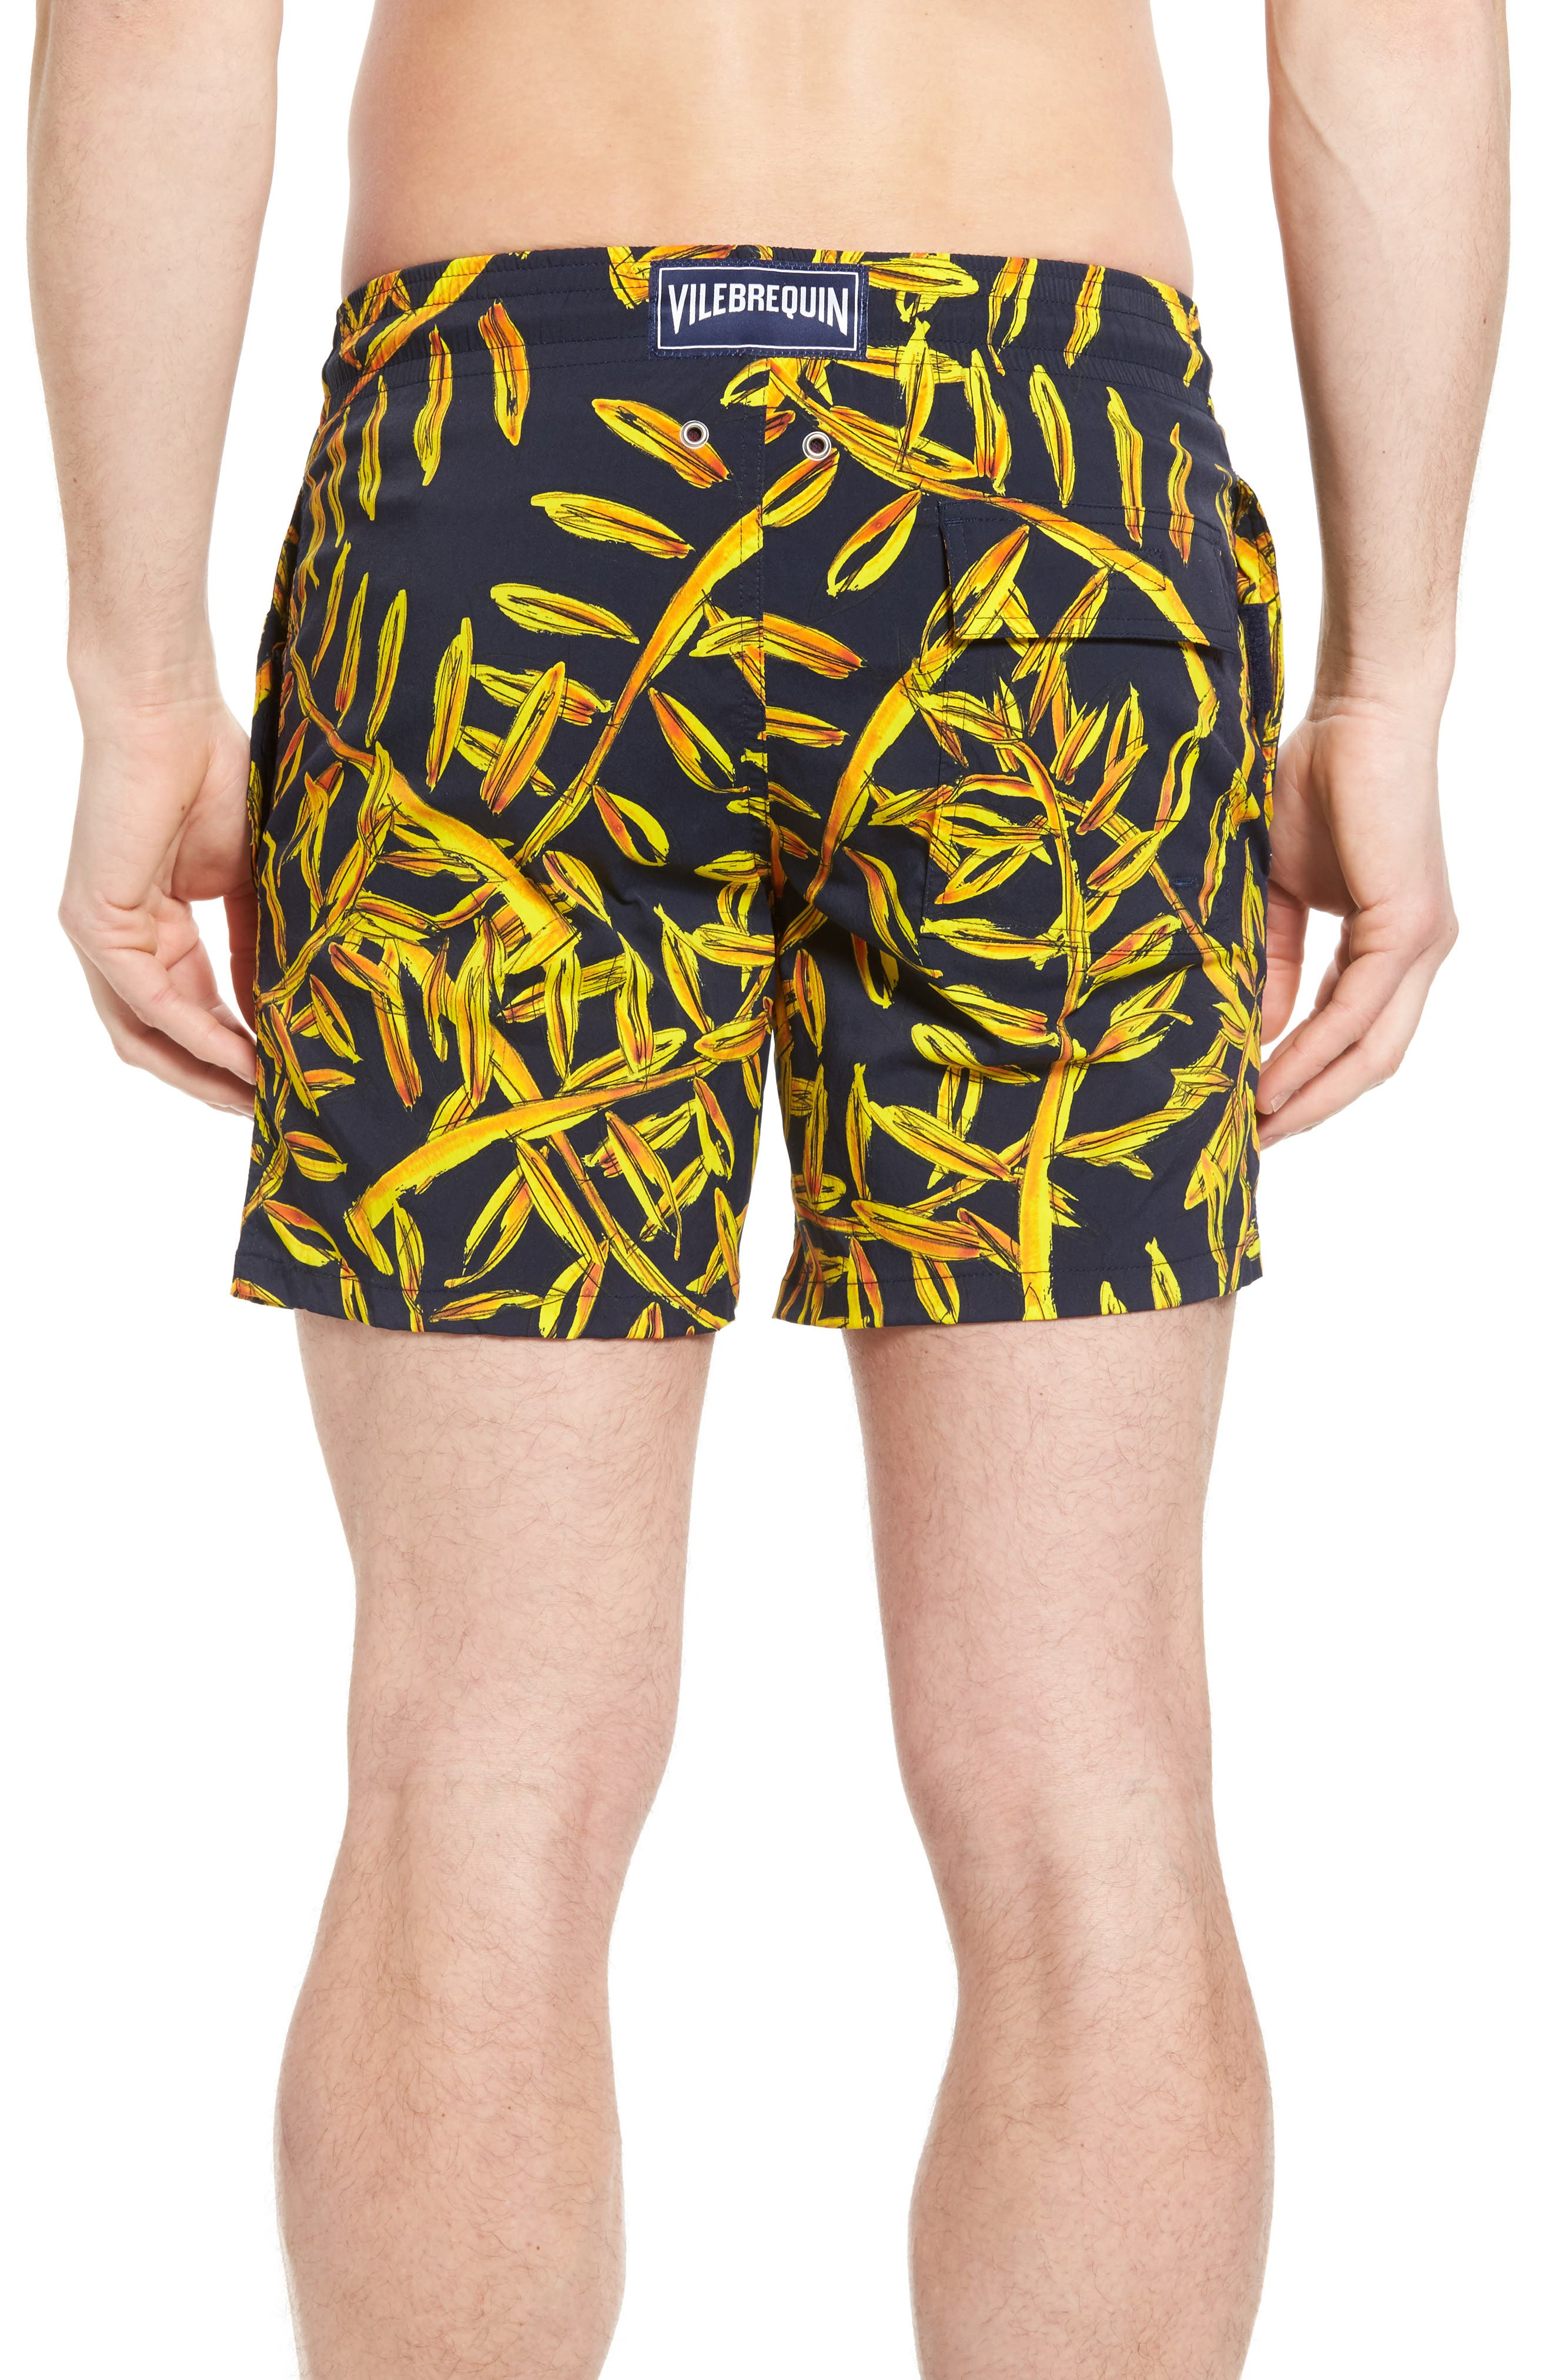 Superflex Gold Palms Print Swim Trunks,                             Alternate thumbnail 2, color,                             NAVY BLUE